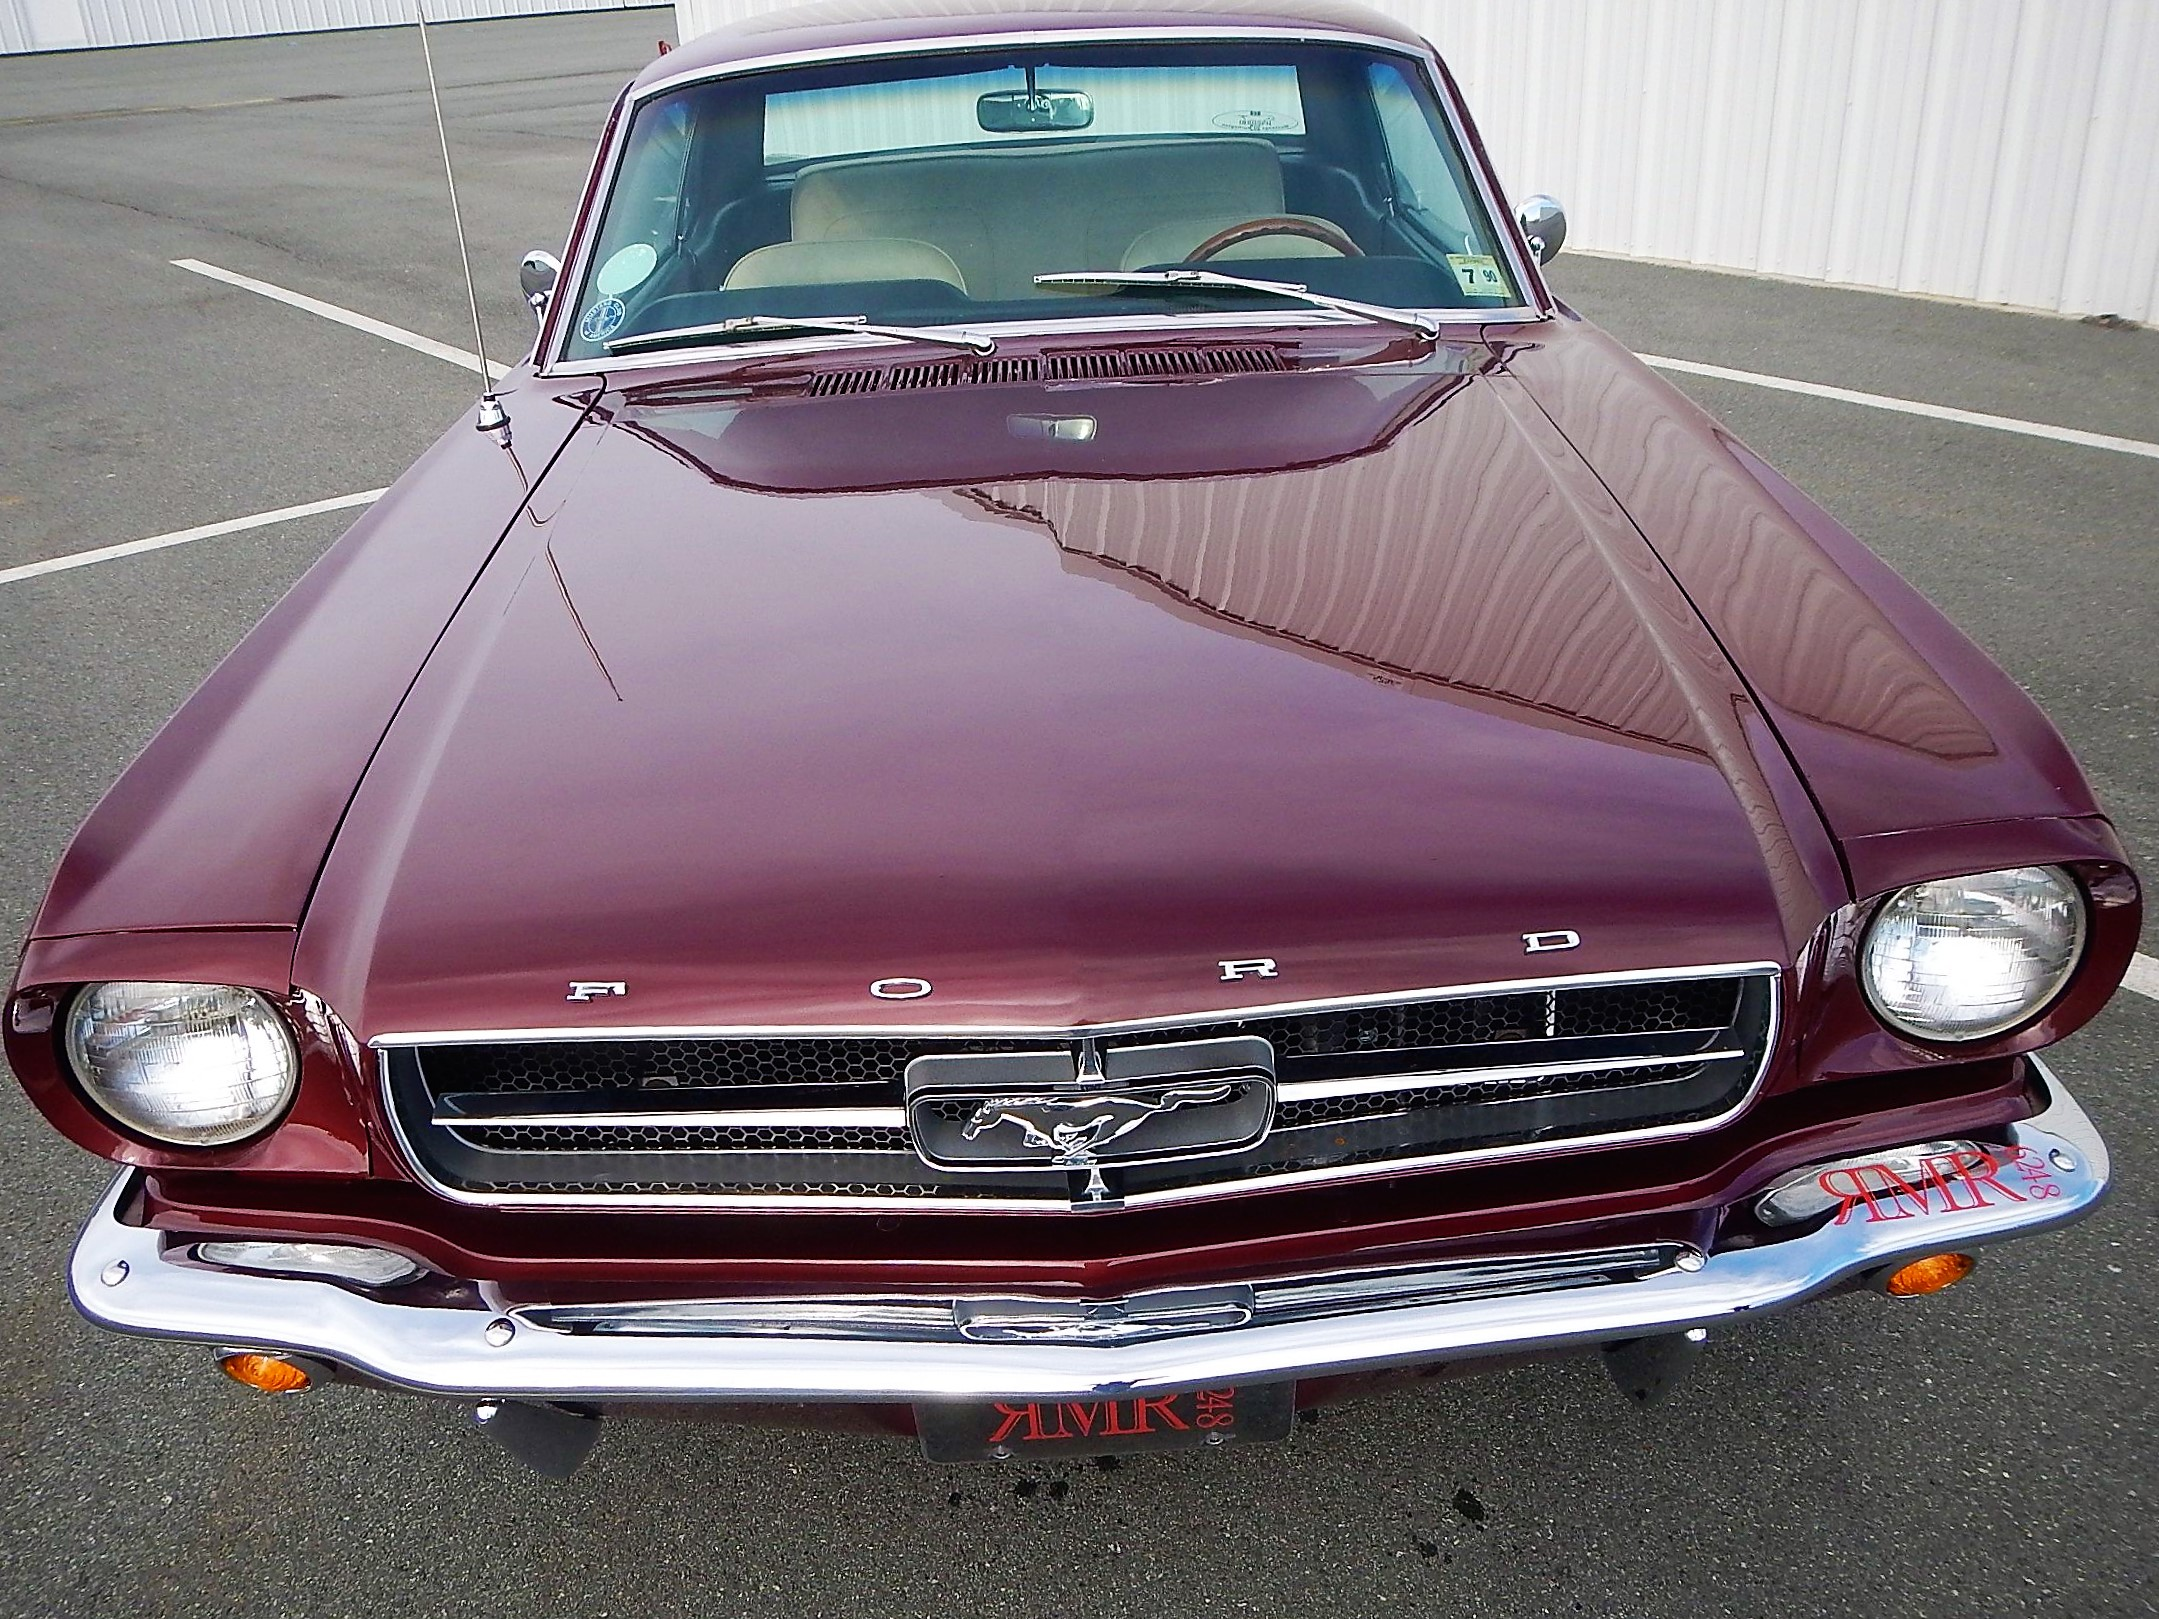 1965 Mustang Paul  012.jpg